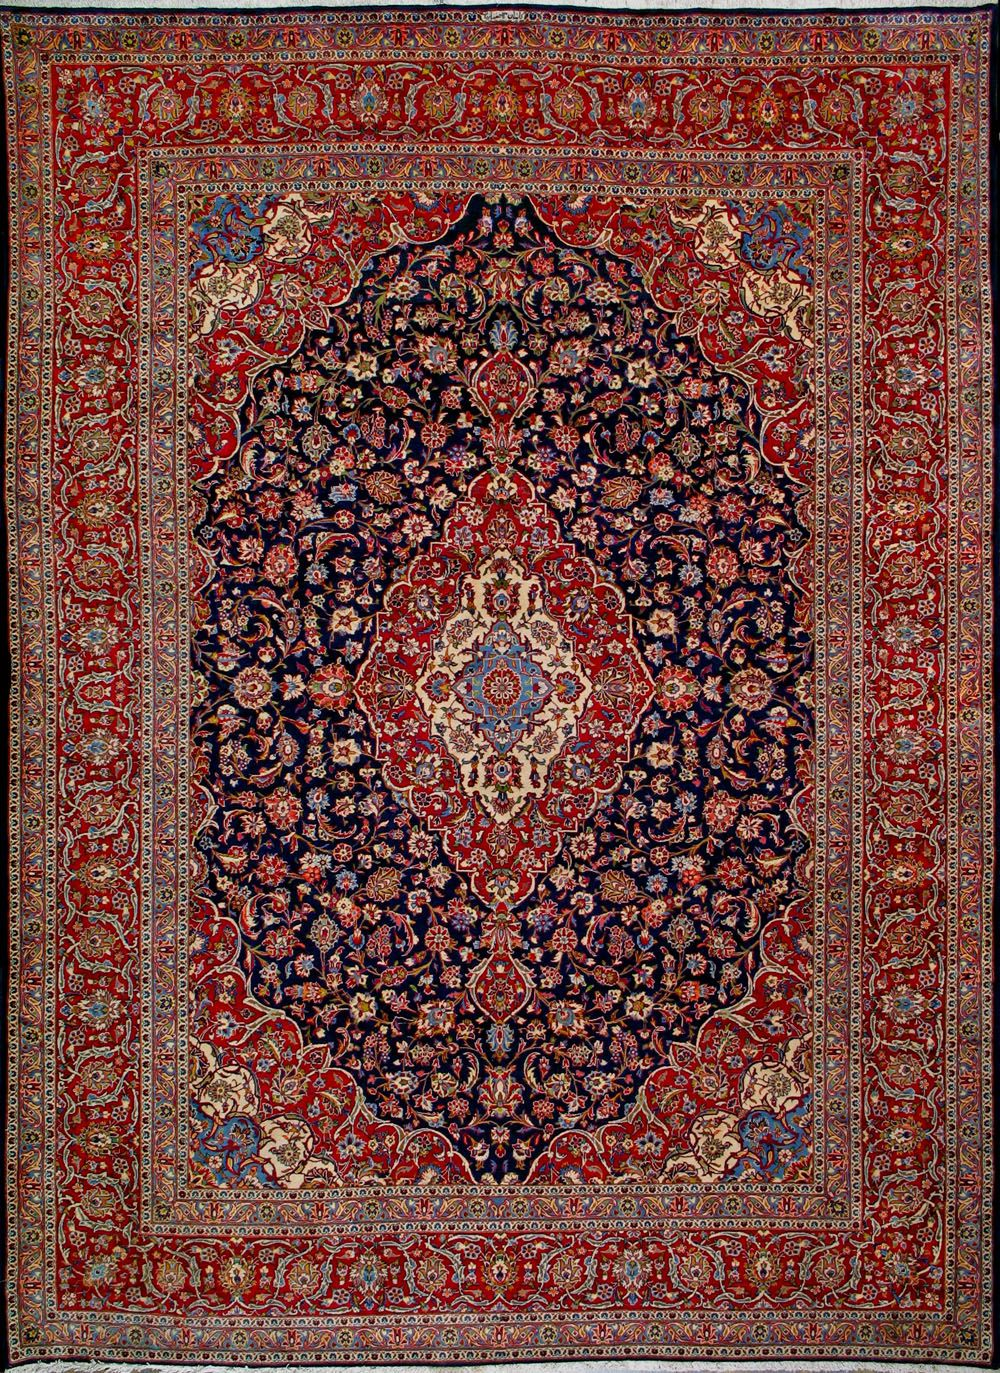 Buy Kashan Persian Rug 9 39 11 Quot X 13 39 5 Quot Authentic Kashan Handmade Rug Persian Rug Patterned Carpet Rugs